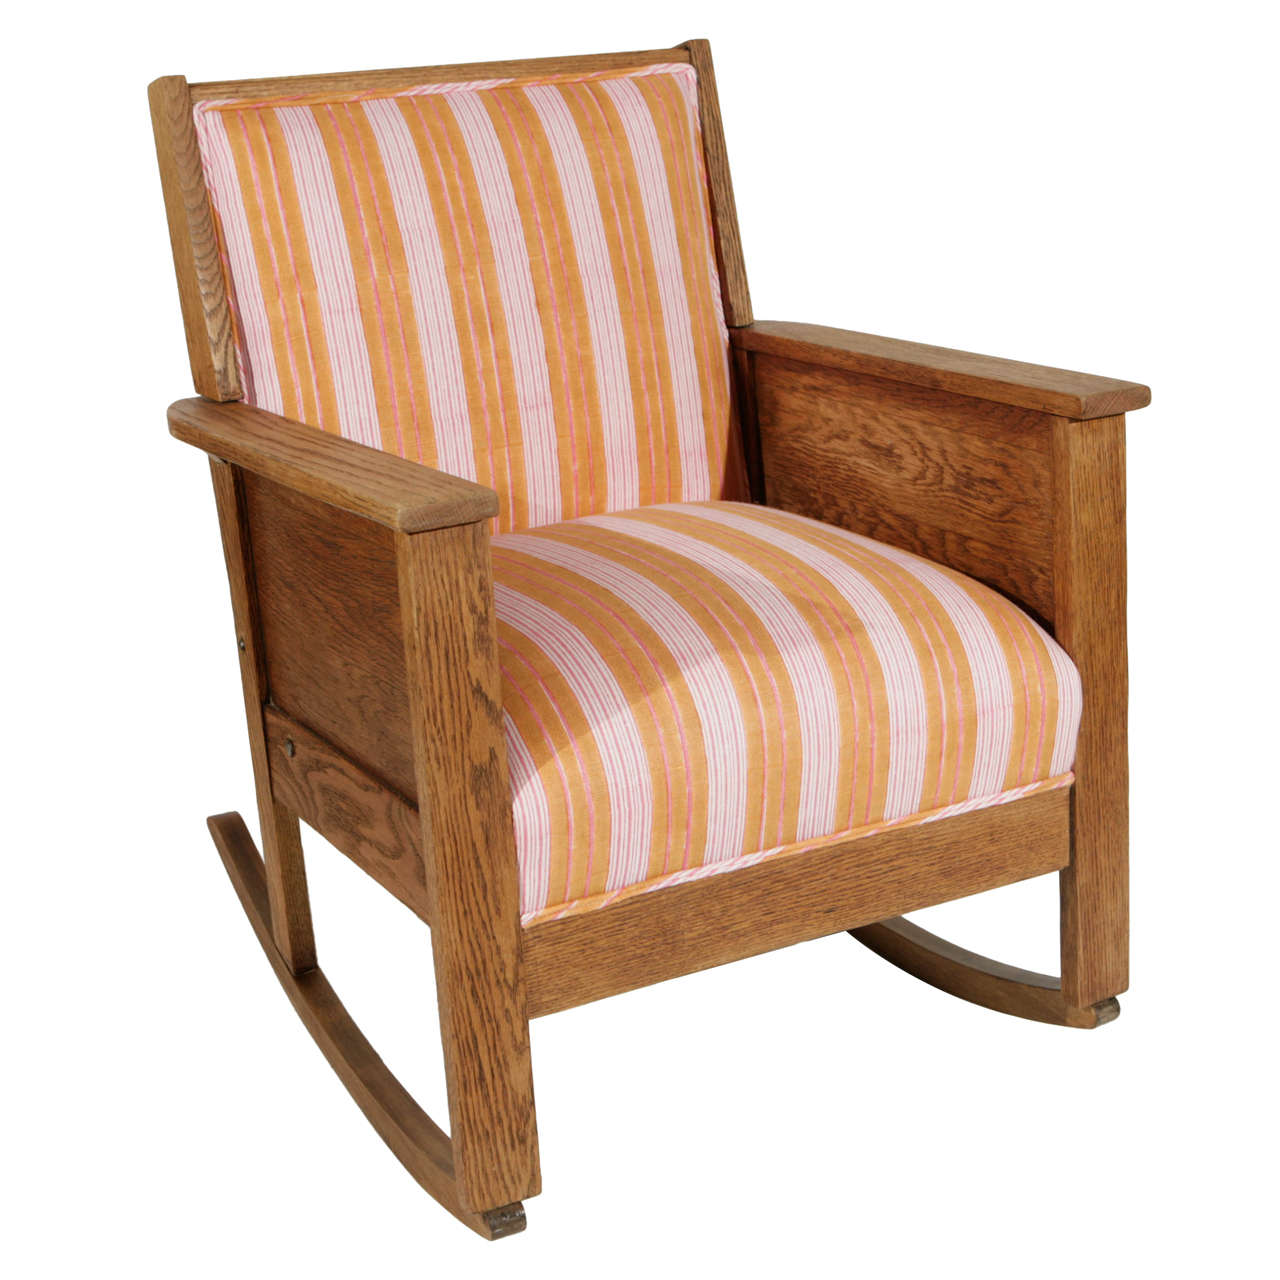 Turn Of The Century American Furniture